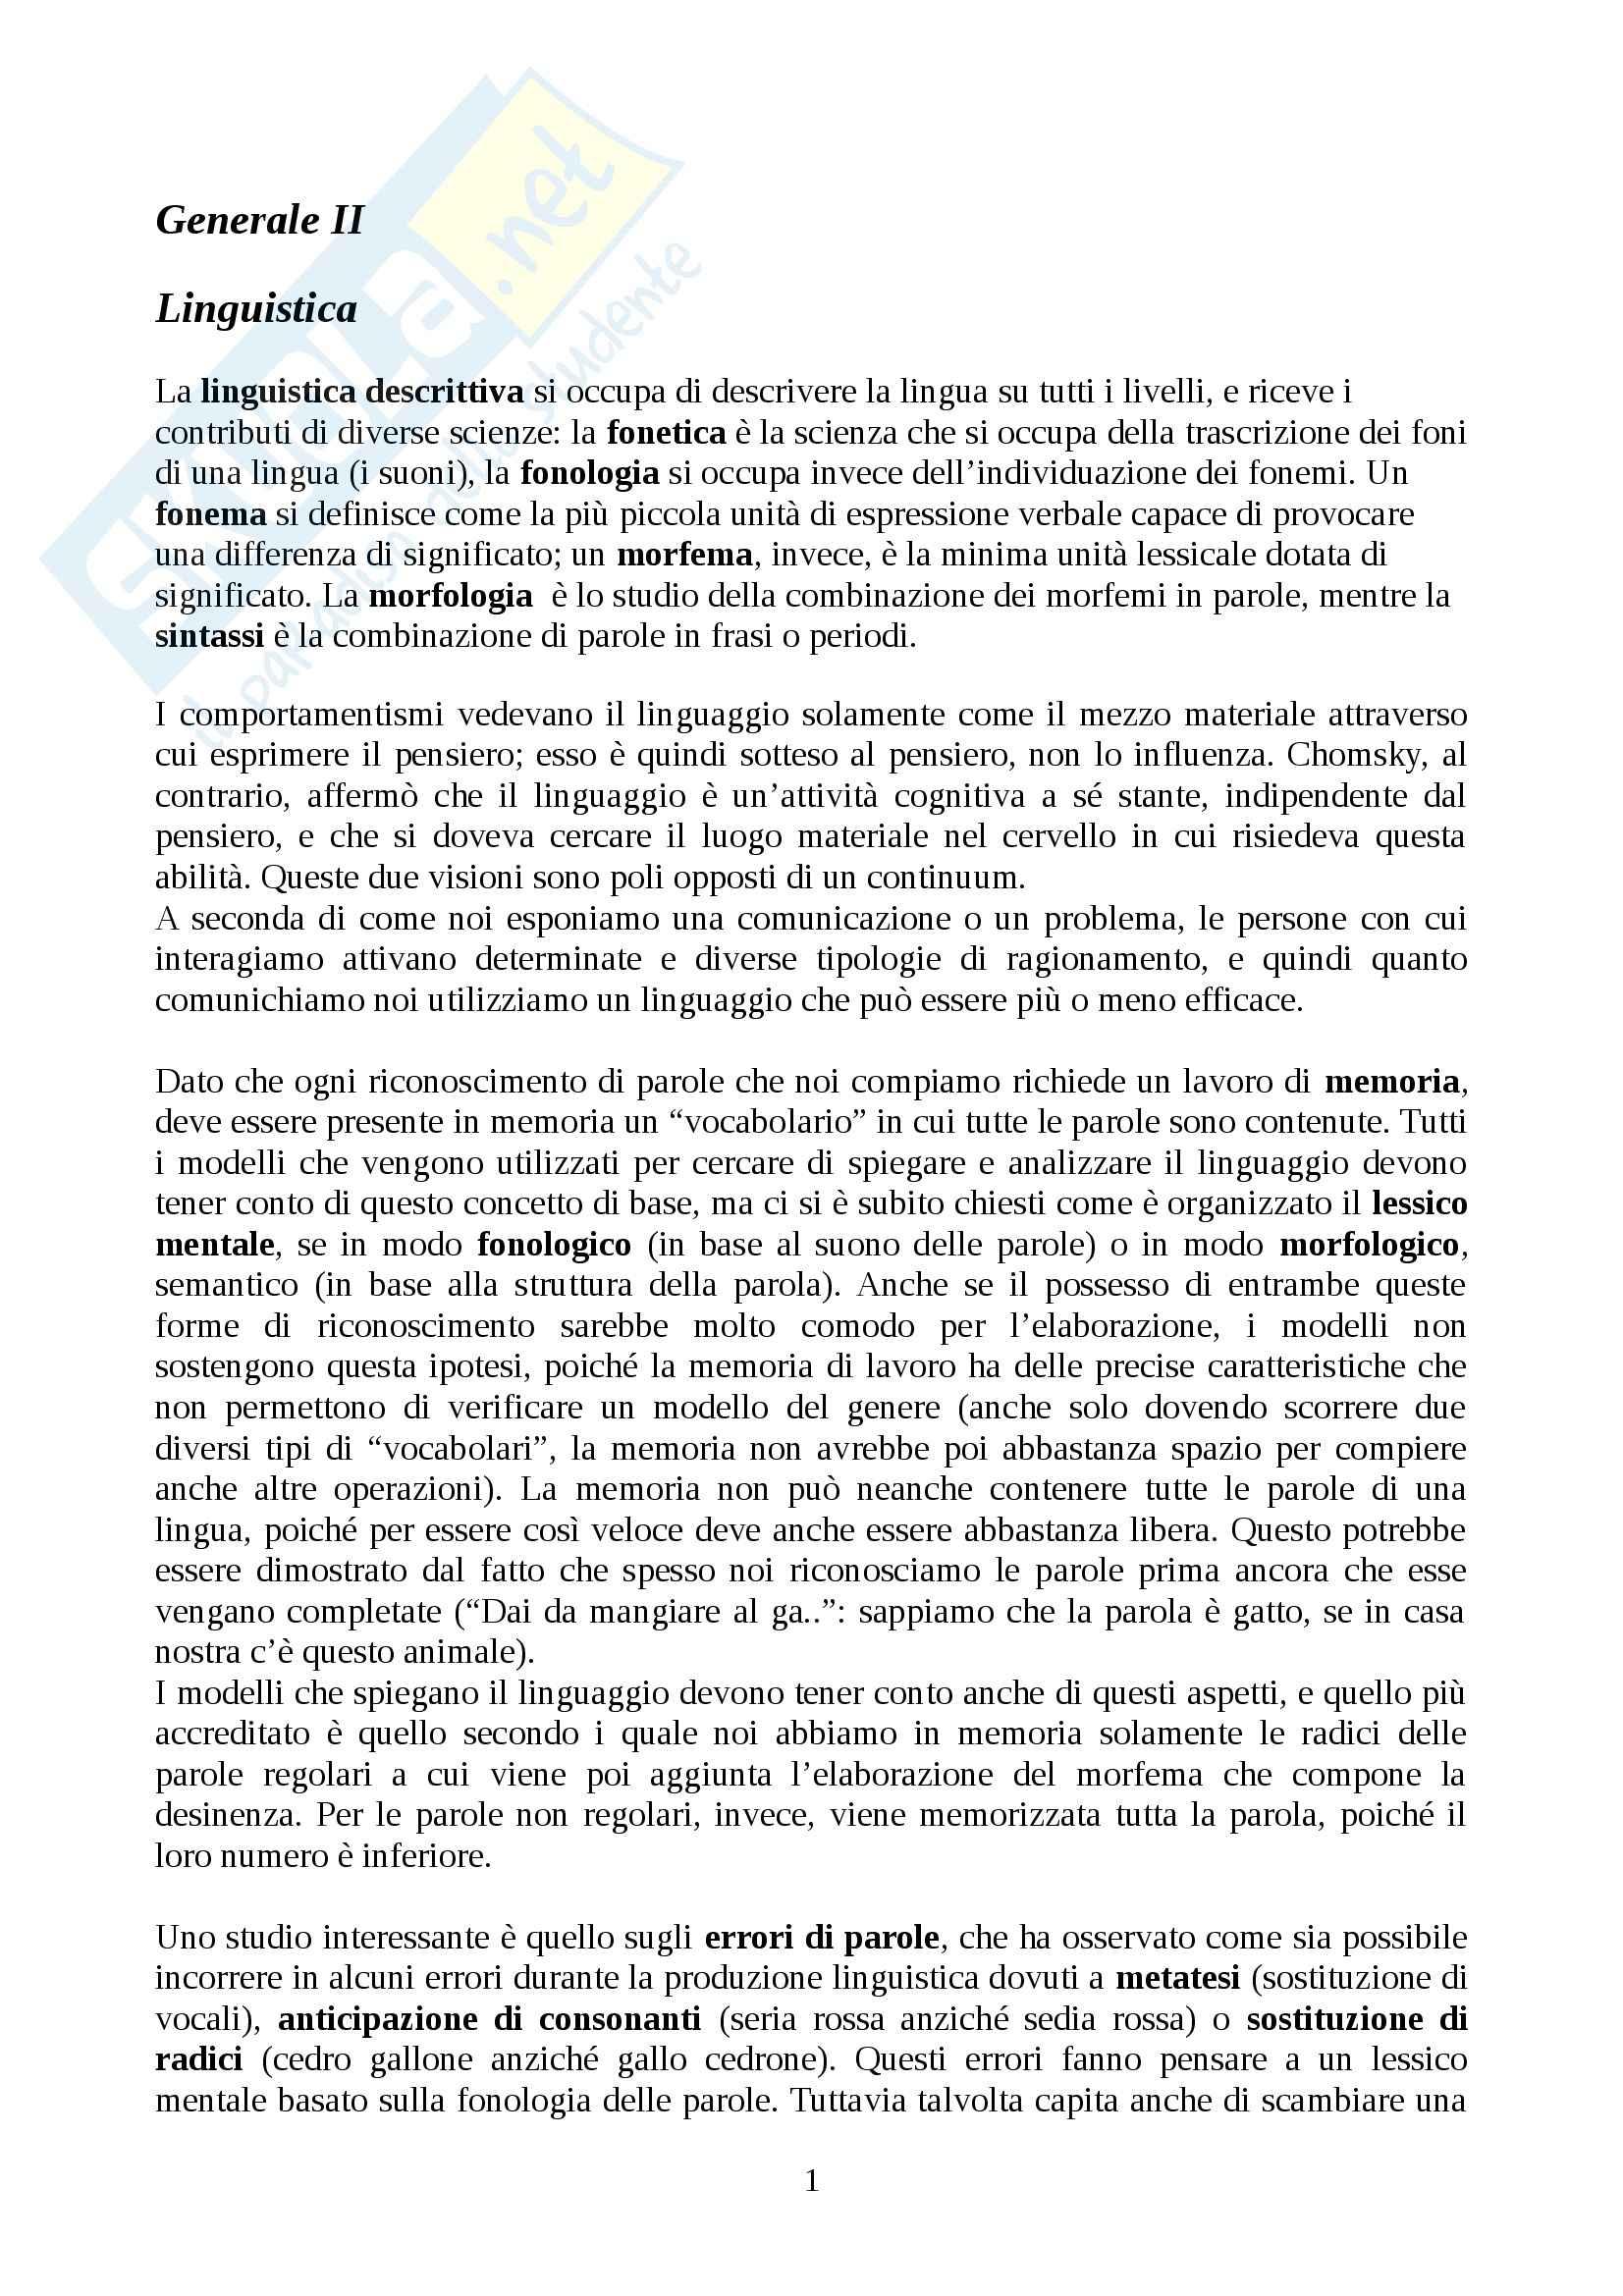 Psicologia generale II - Appunti